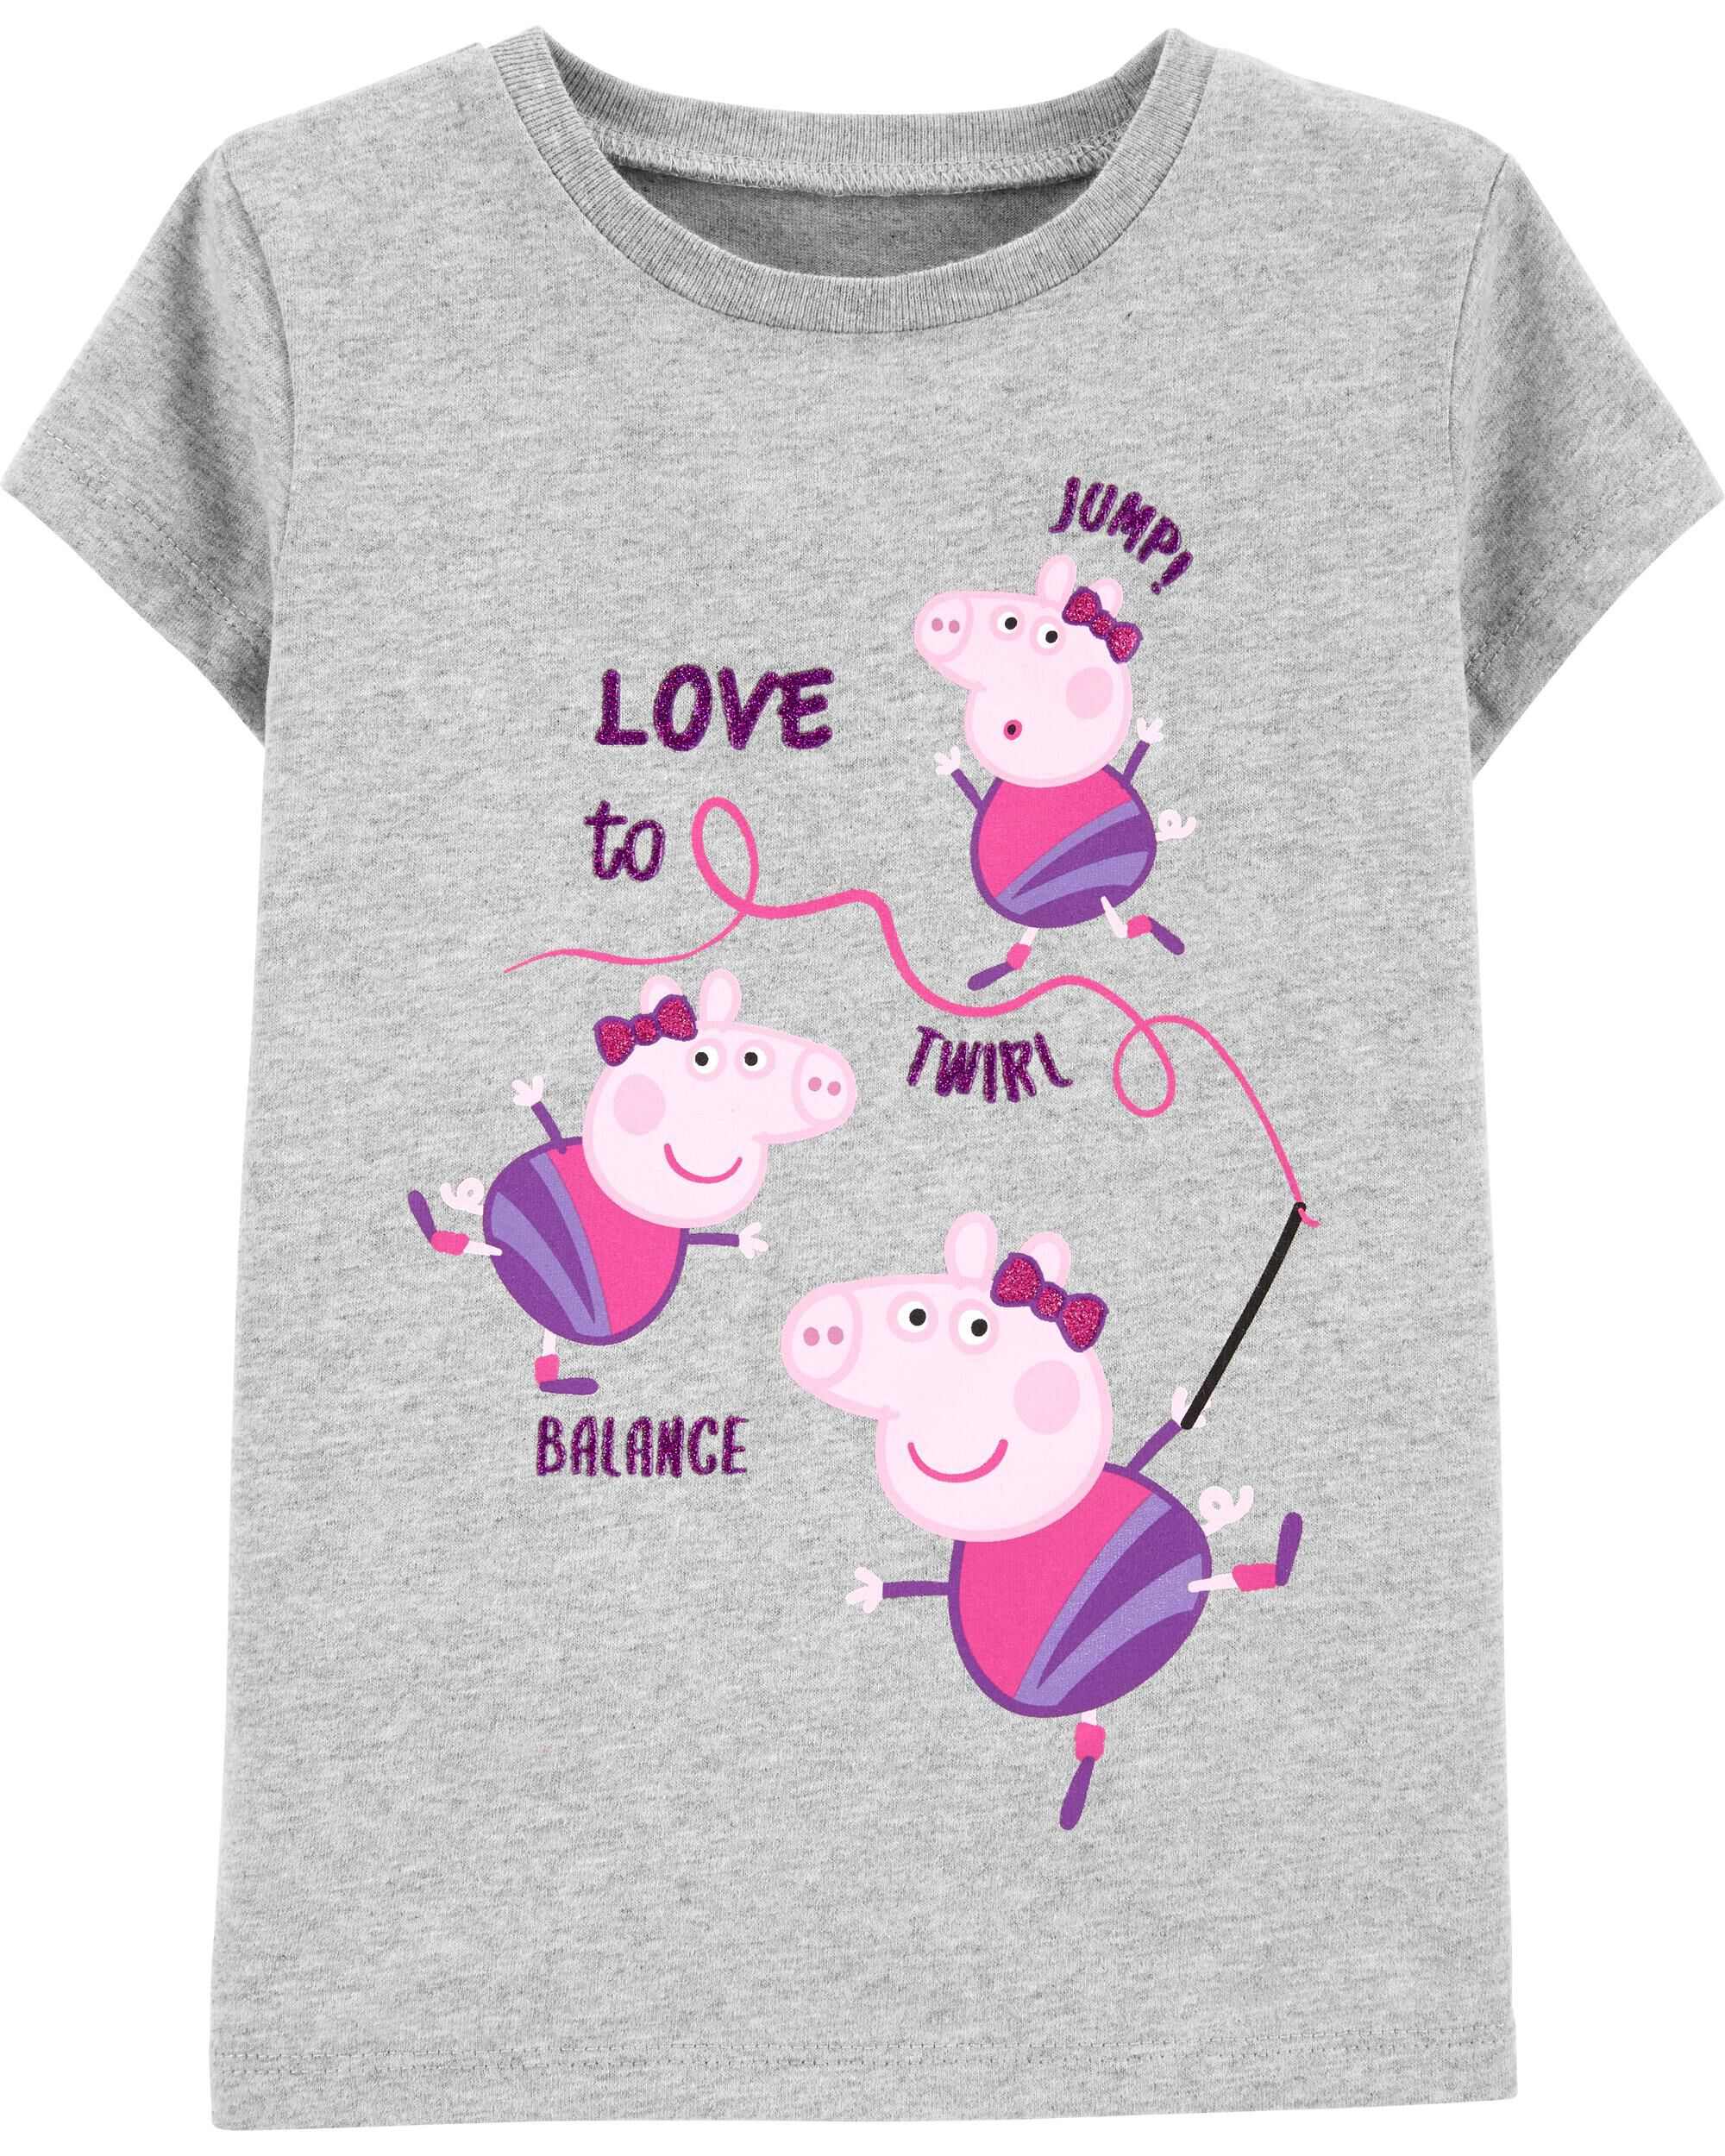 NWT Girls Peppa Pig Pink Flower Power Grahic L//S Shirt Tee Top Size 5 5T